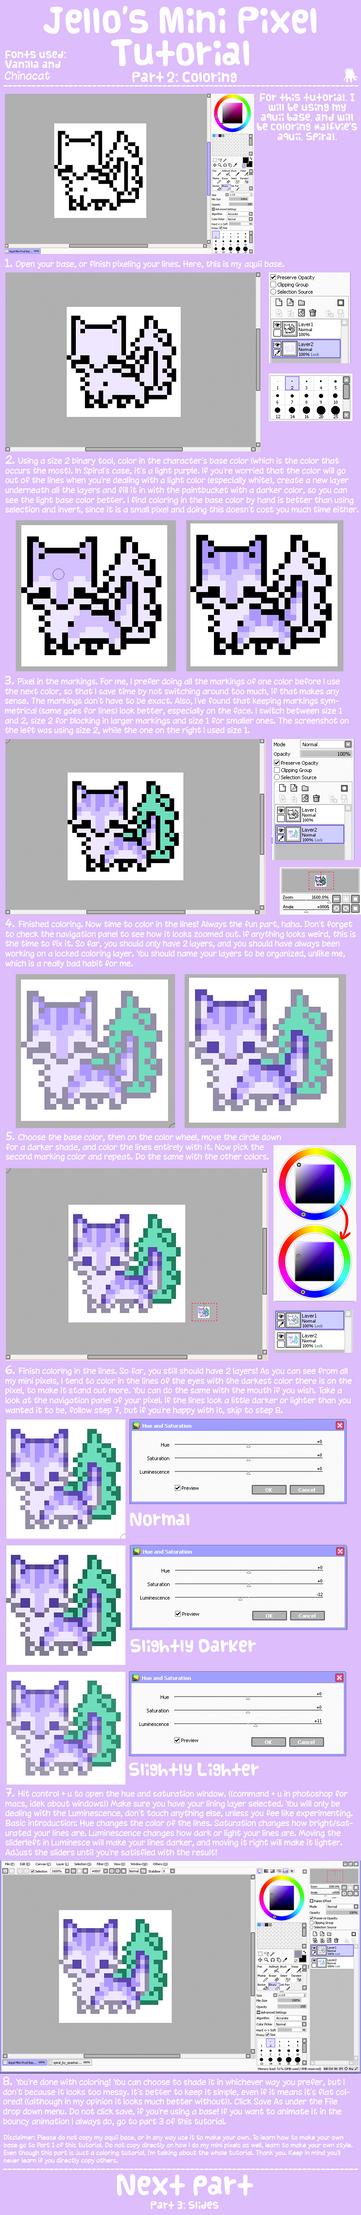 Mini Pixels Part 2 by twinelights